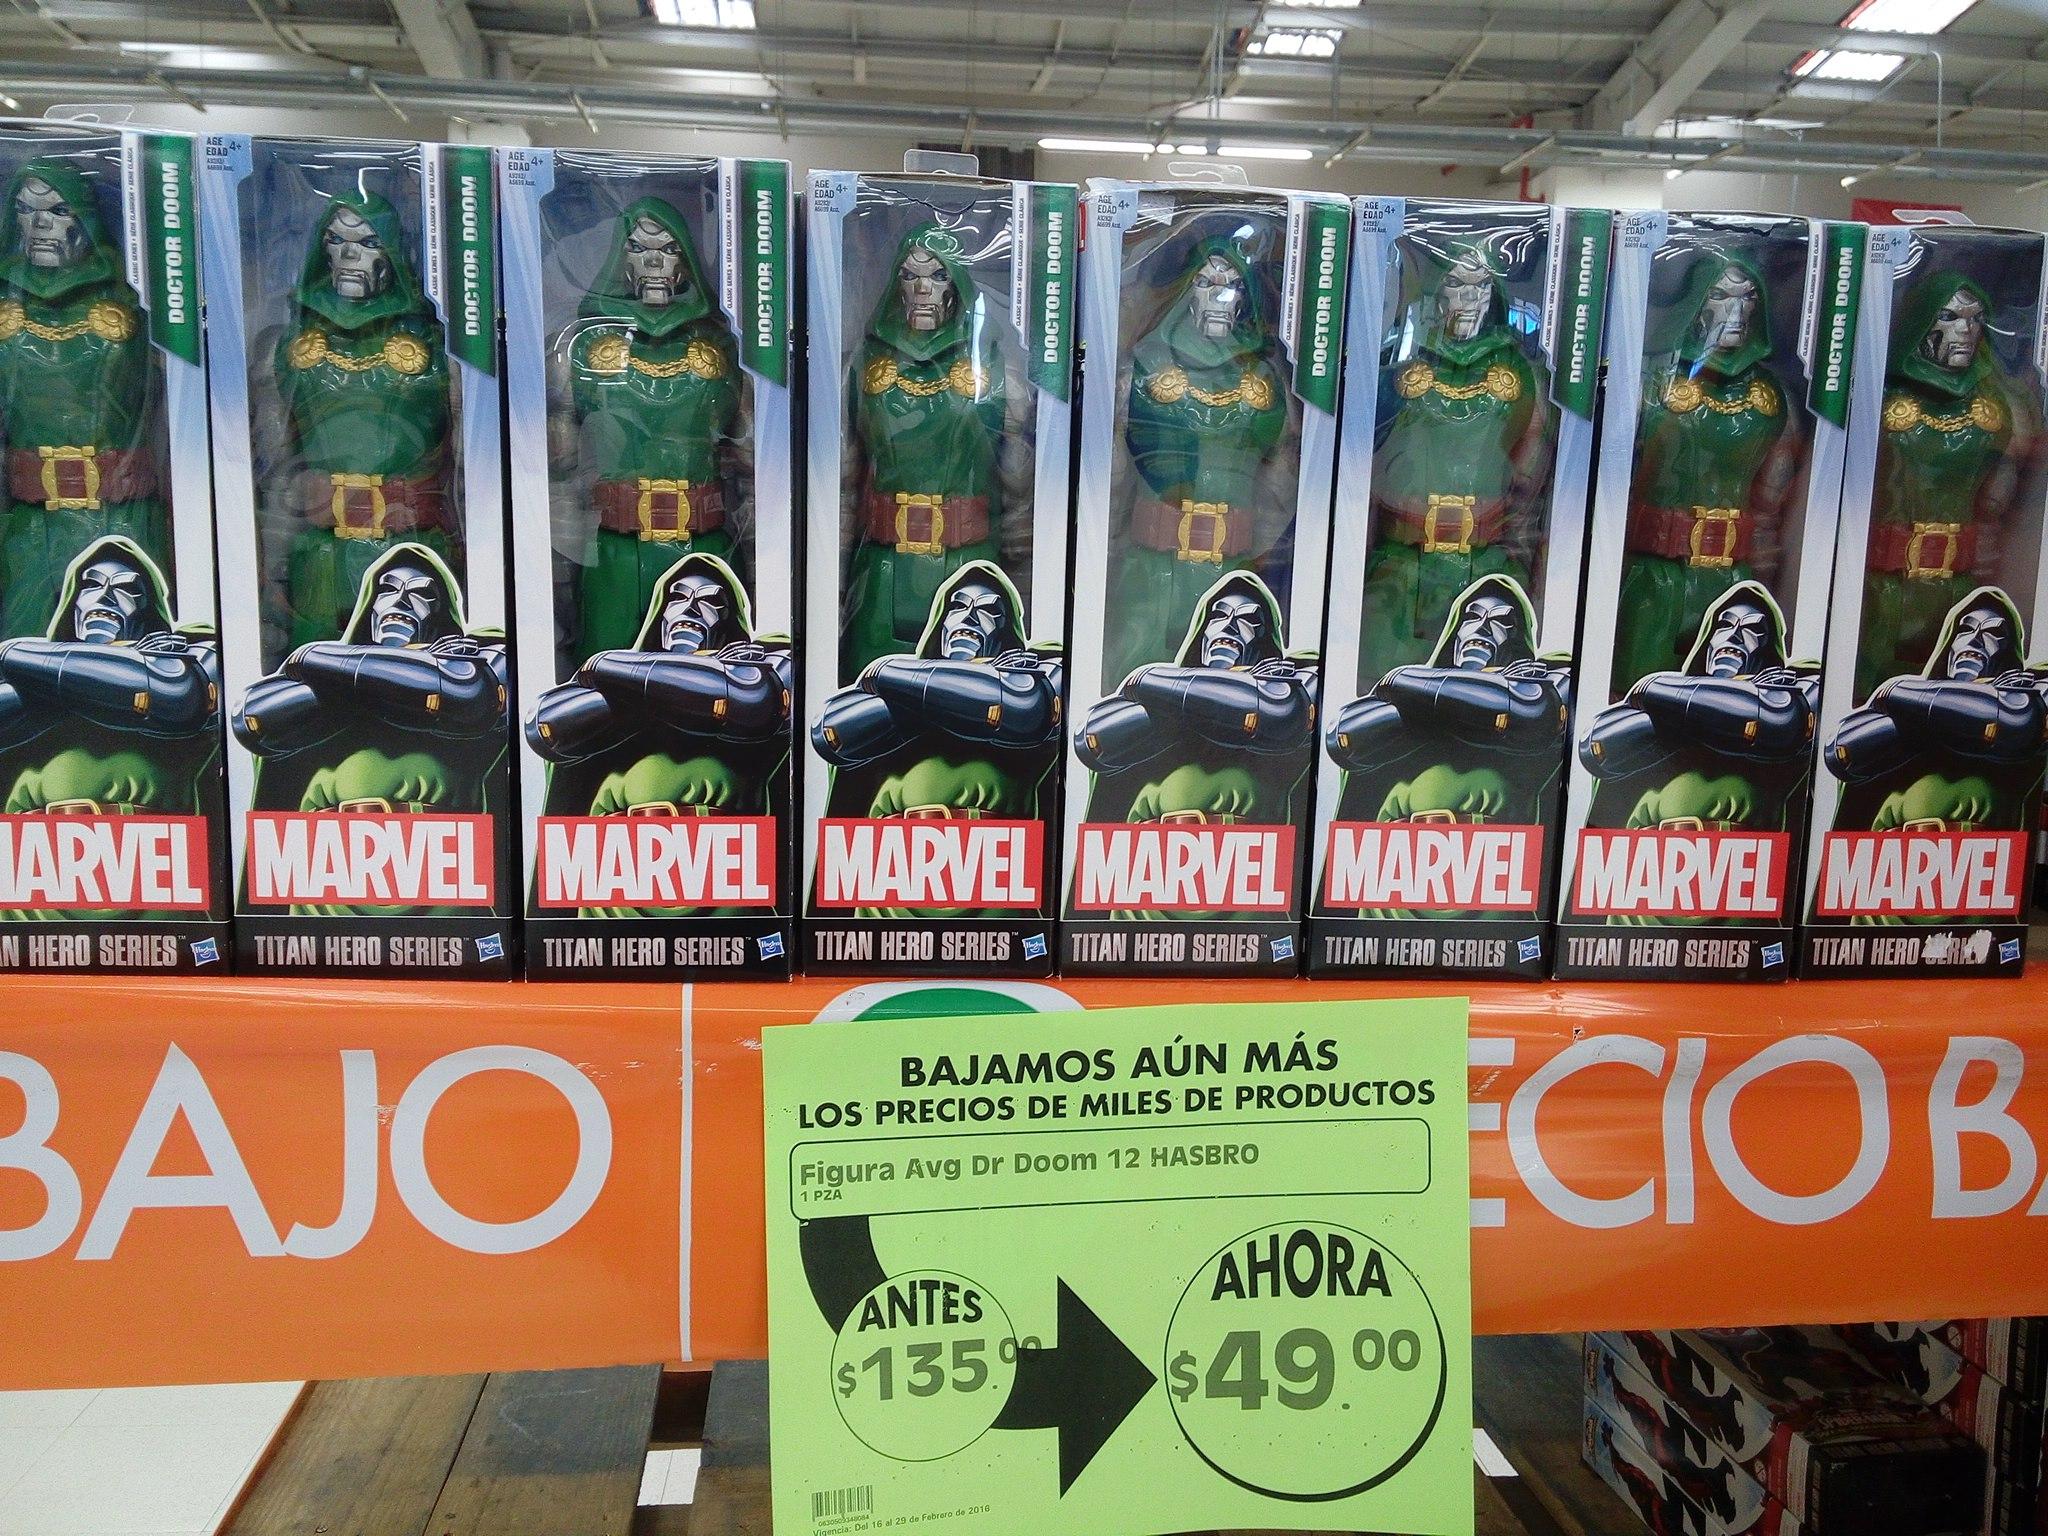 Comercial Mexicana: figuras de Marvel a $49 y Avengers a $59